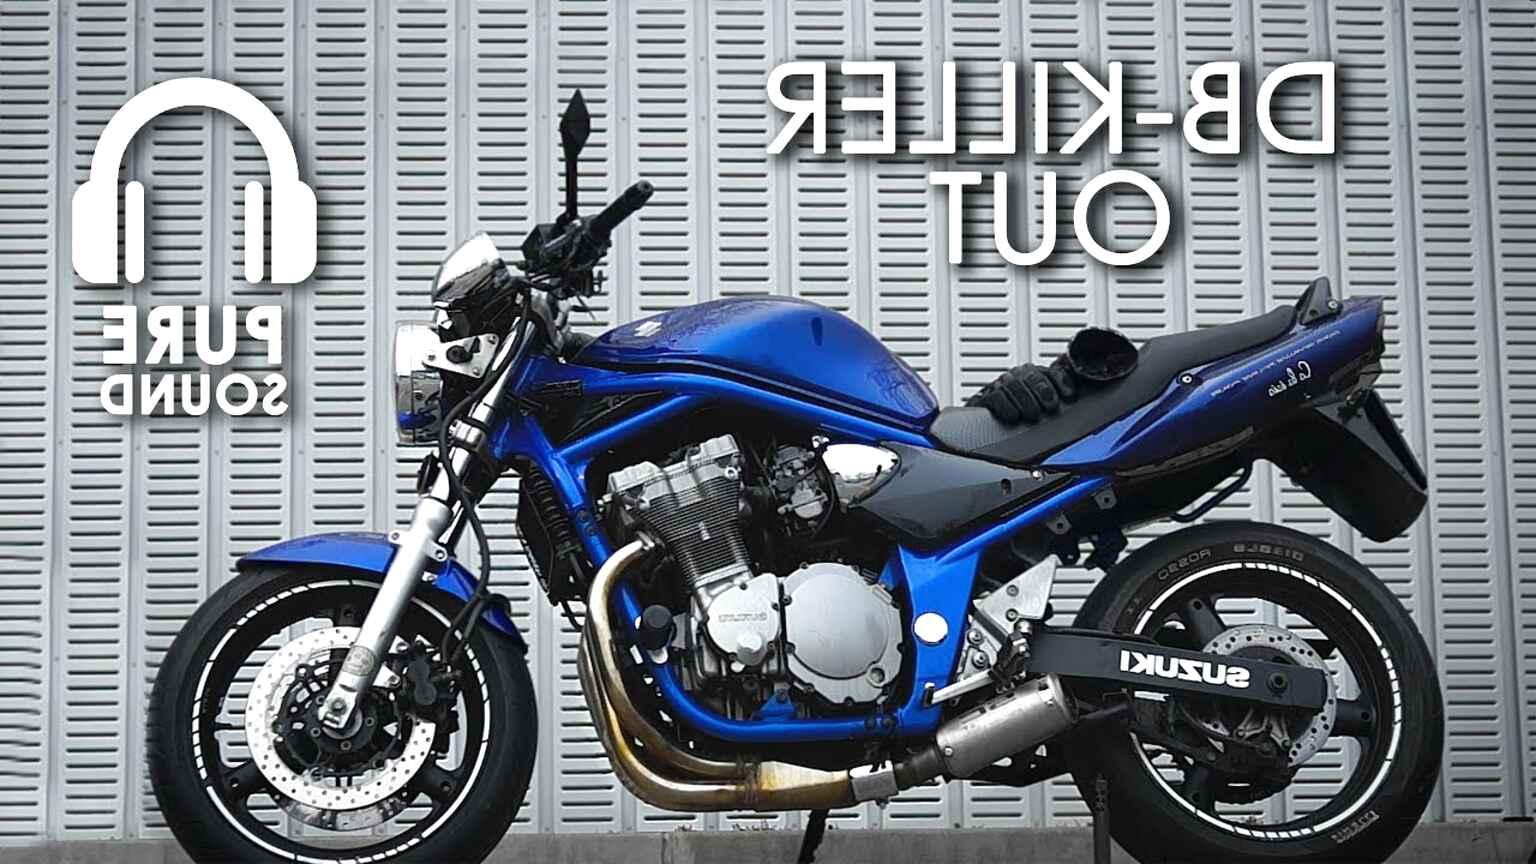 Suzuki Bandit 600 Exhaust For Sale In Uk View 69 Ads